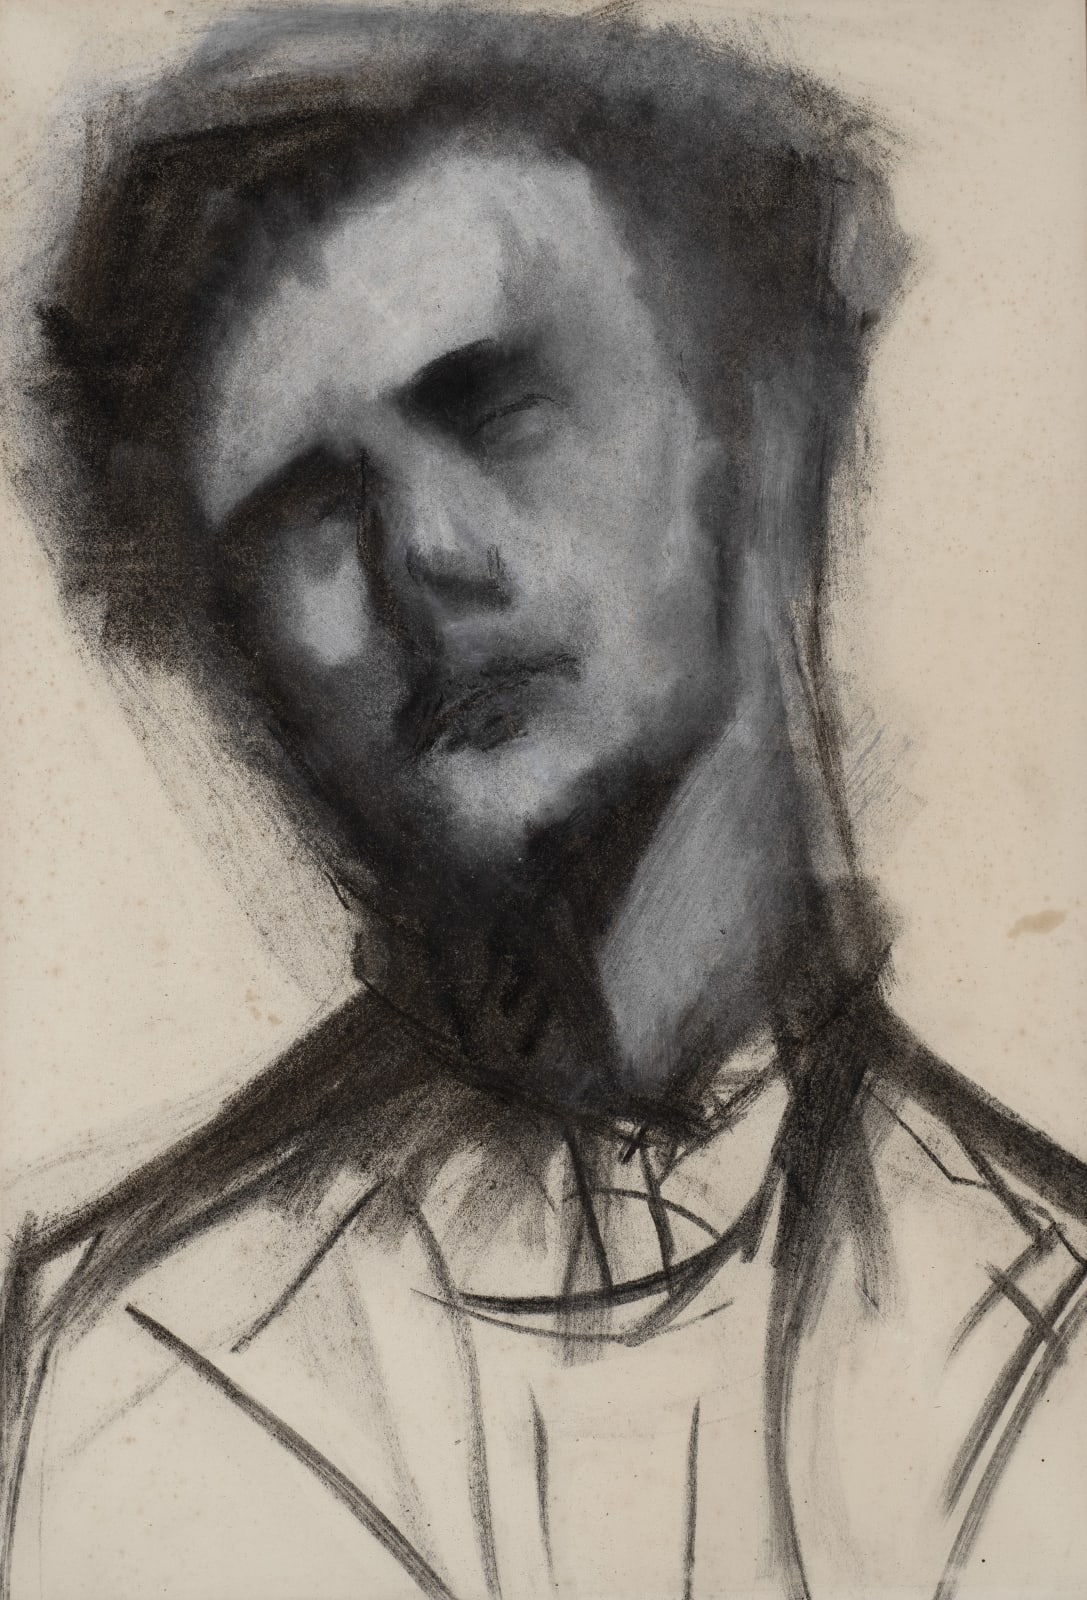 Gustav Metzger Head of a Man, c. 1952 Chalk on paper 86 x 64cm. The Gustav Metzger Foundation